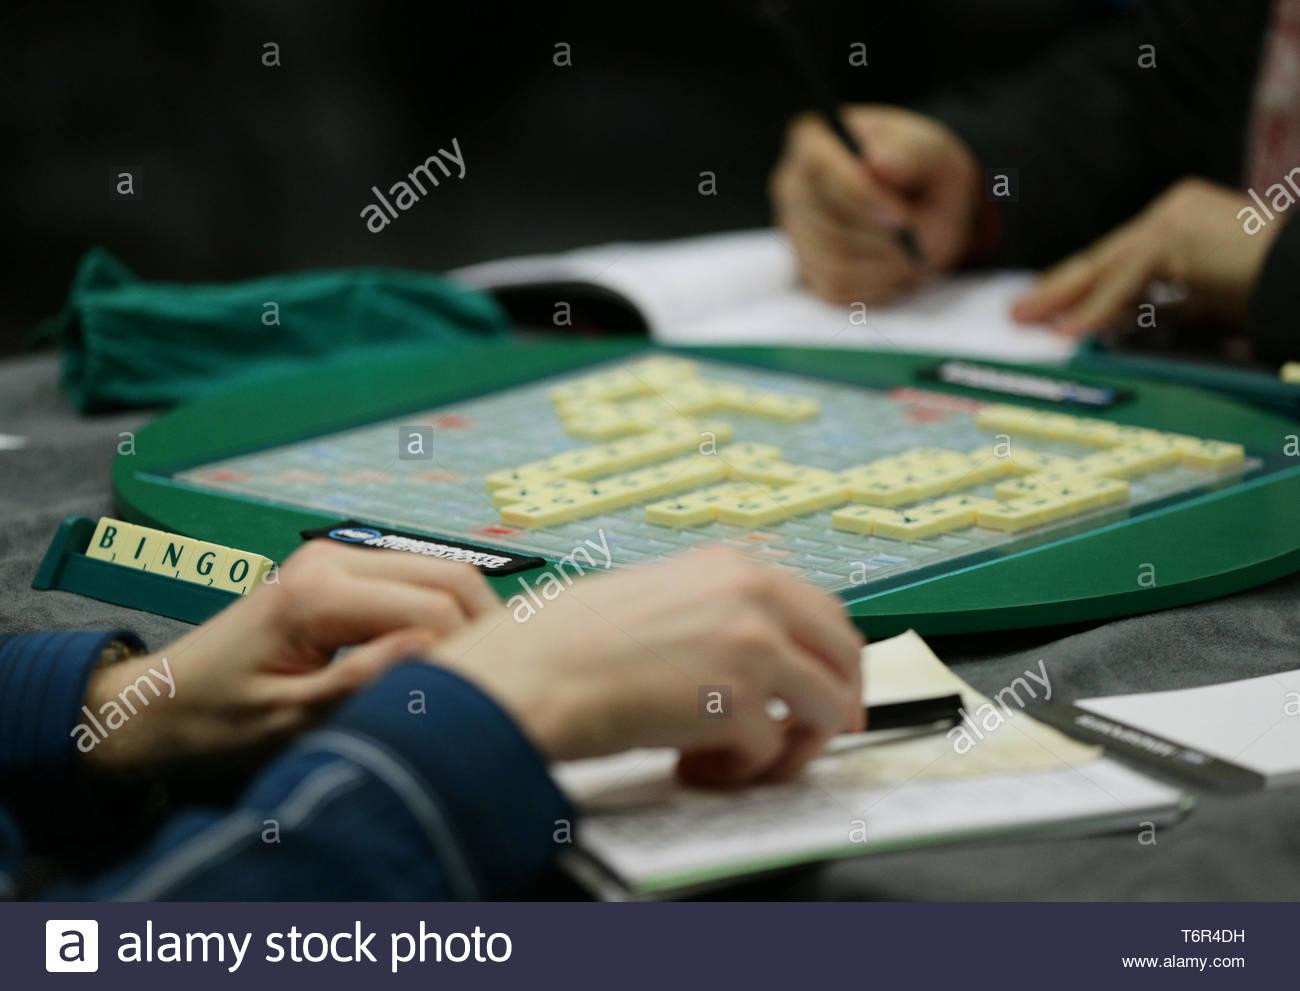 dating Scrabble levyt